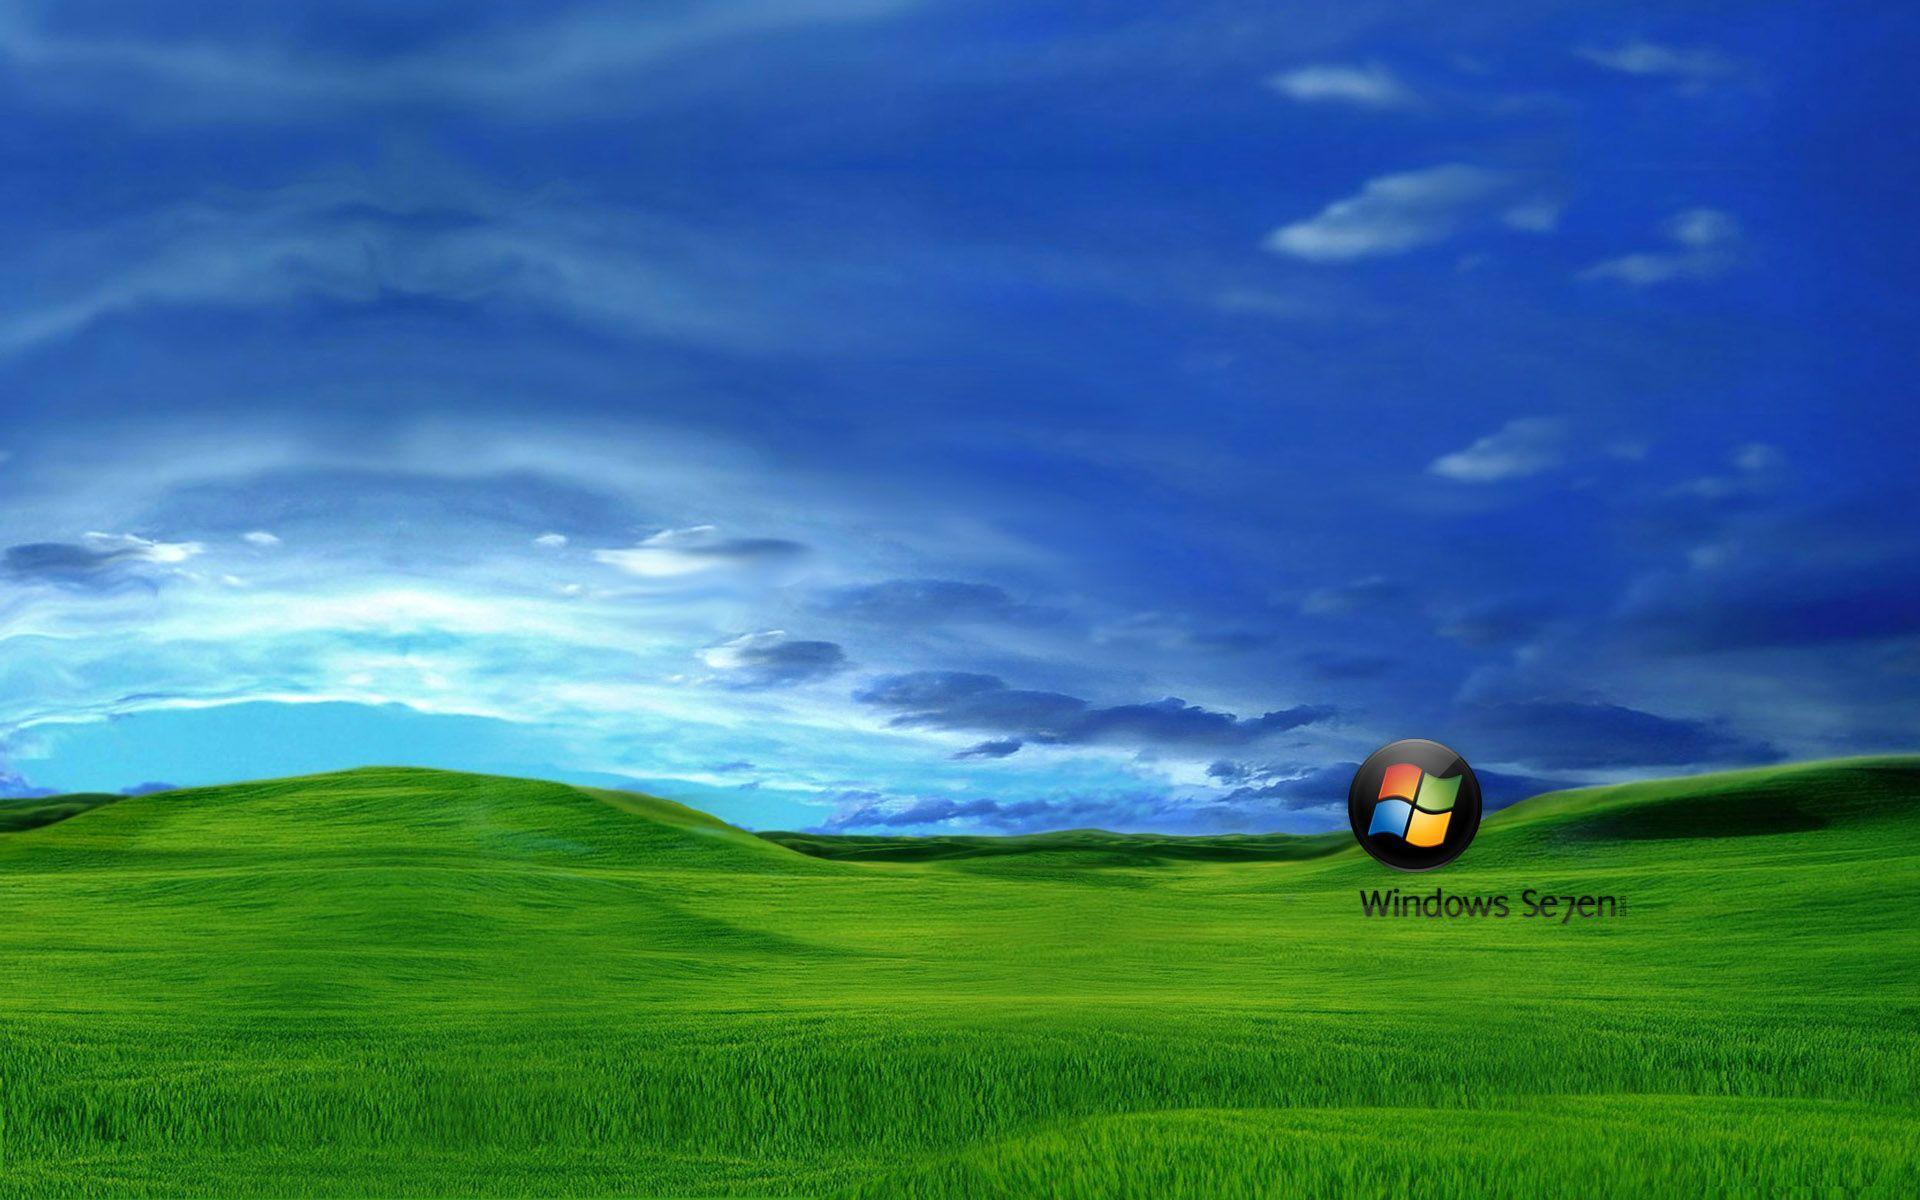 Windows 7 desktop wallpaper location